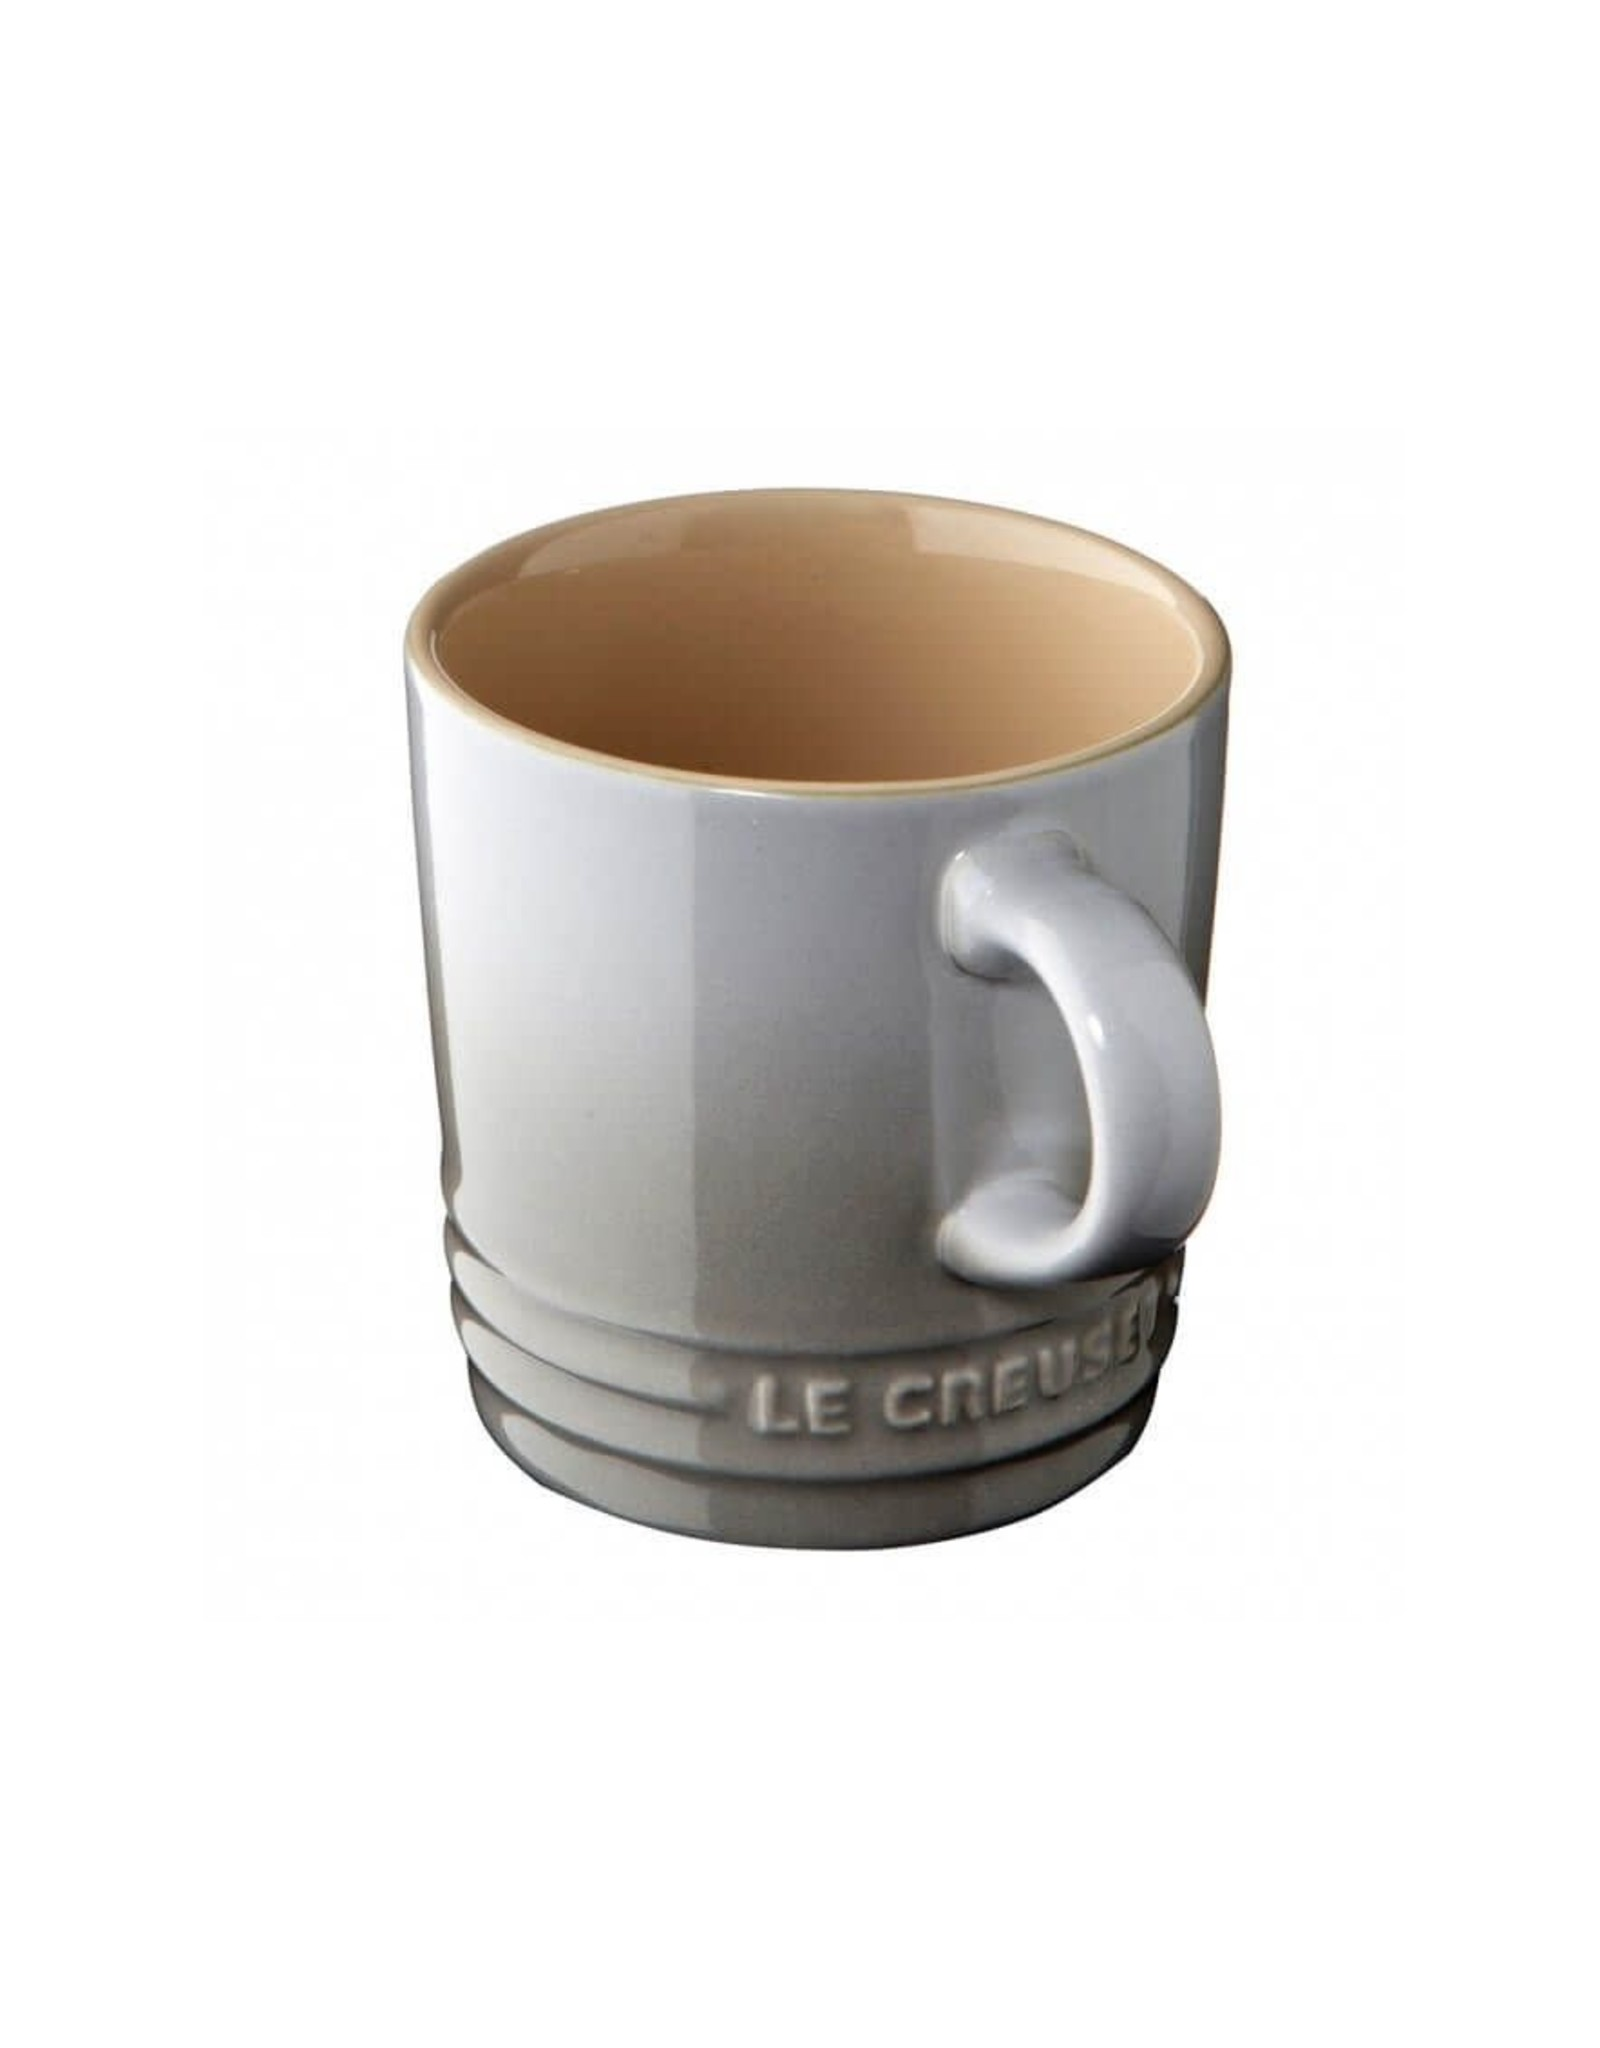 LE CREUSET. 200ml Cappuccino Mug MIST GREY